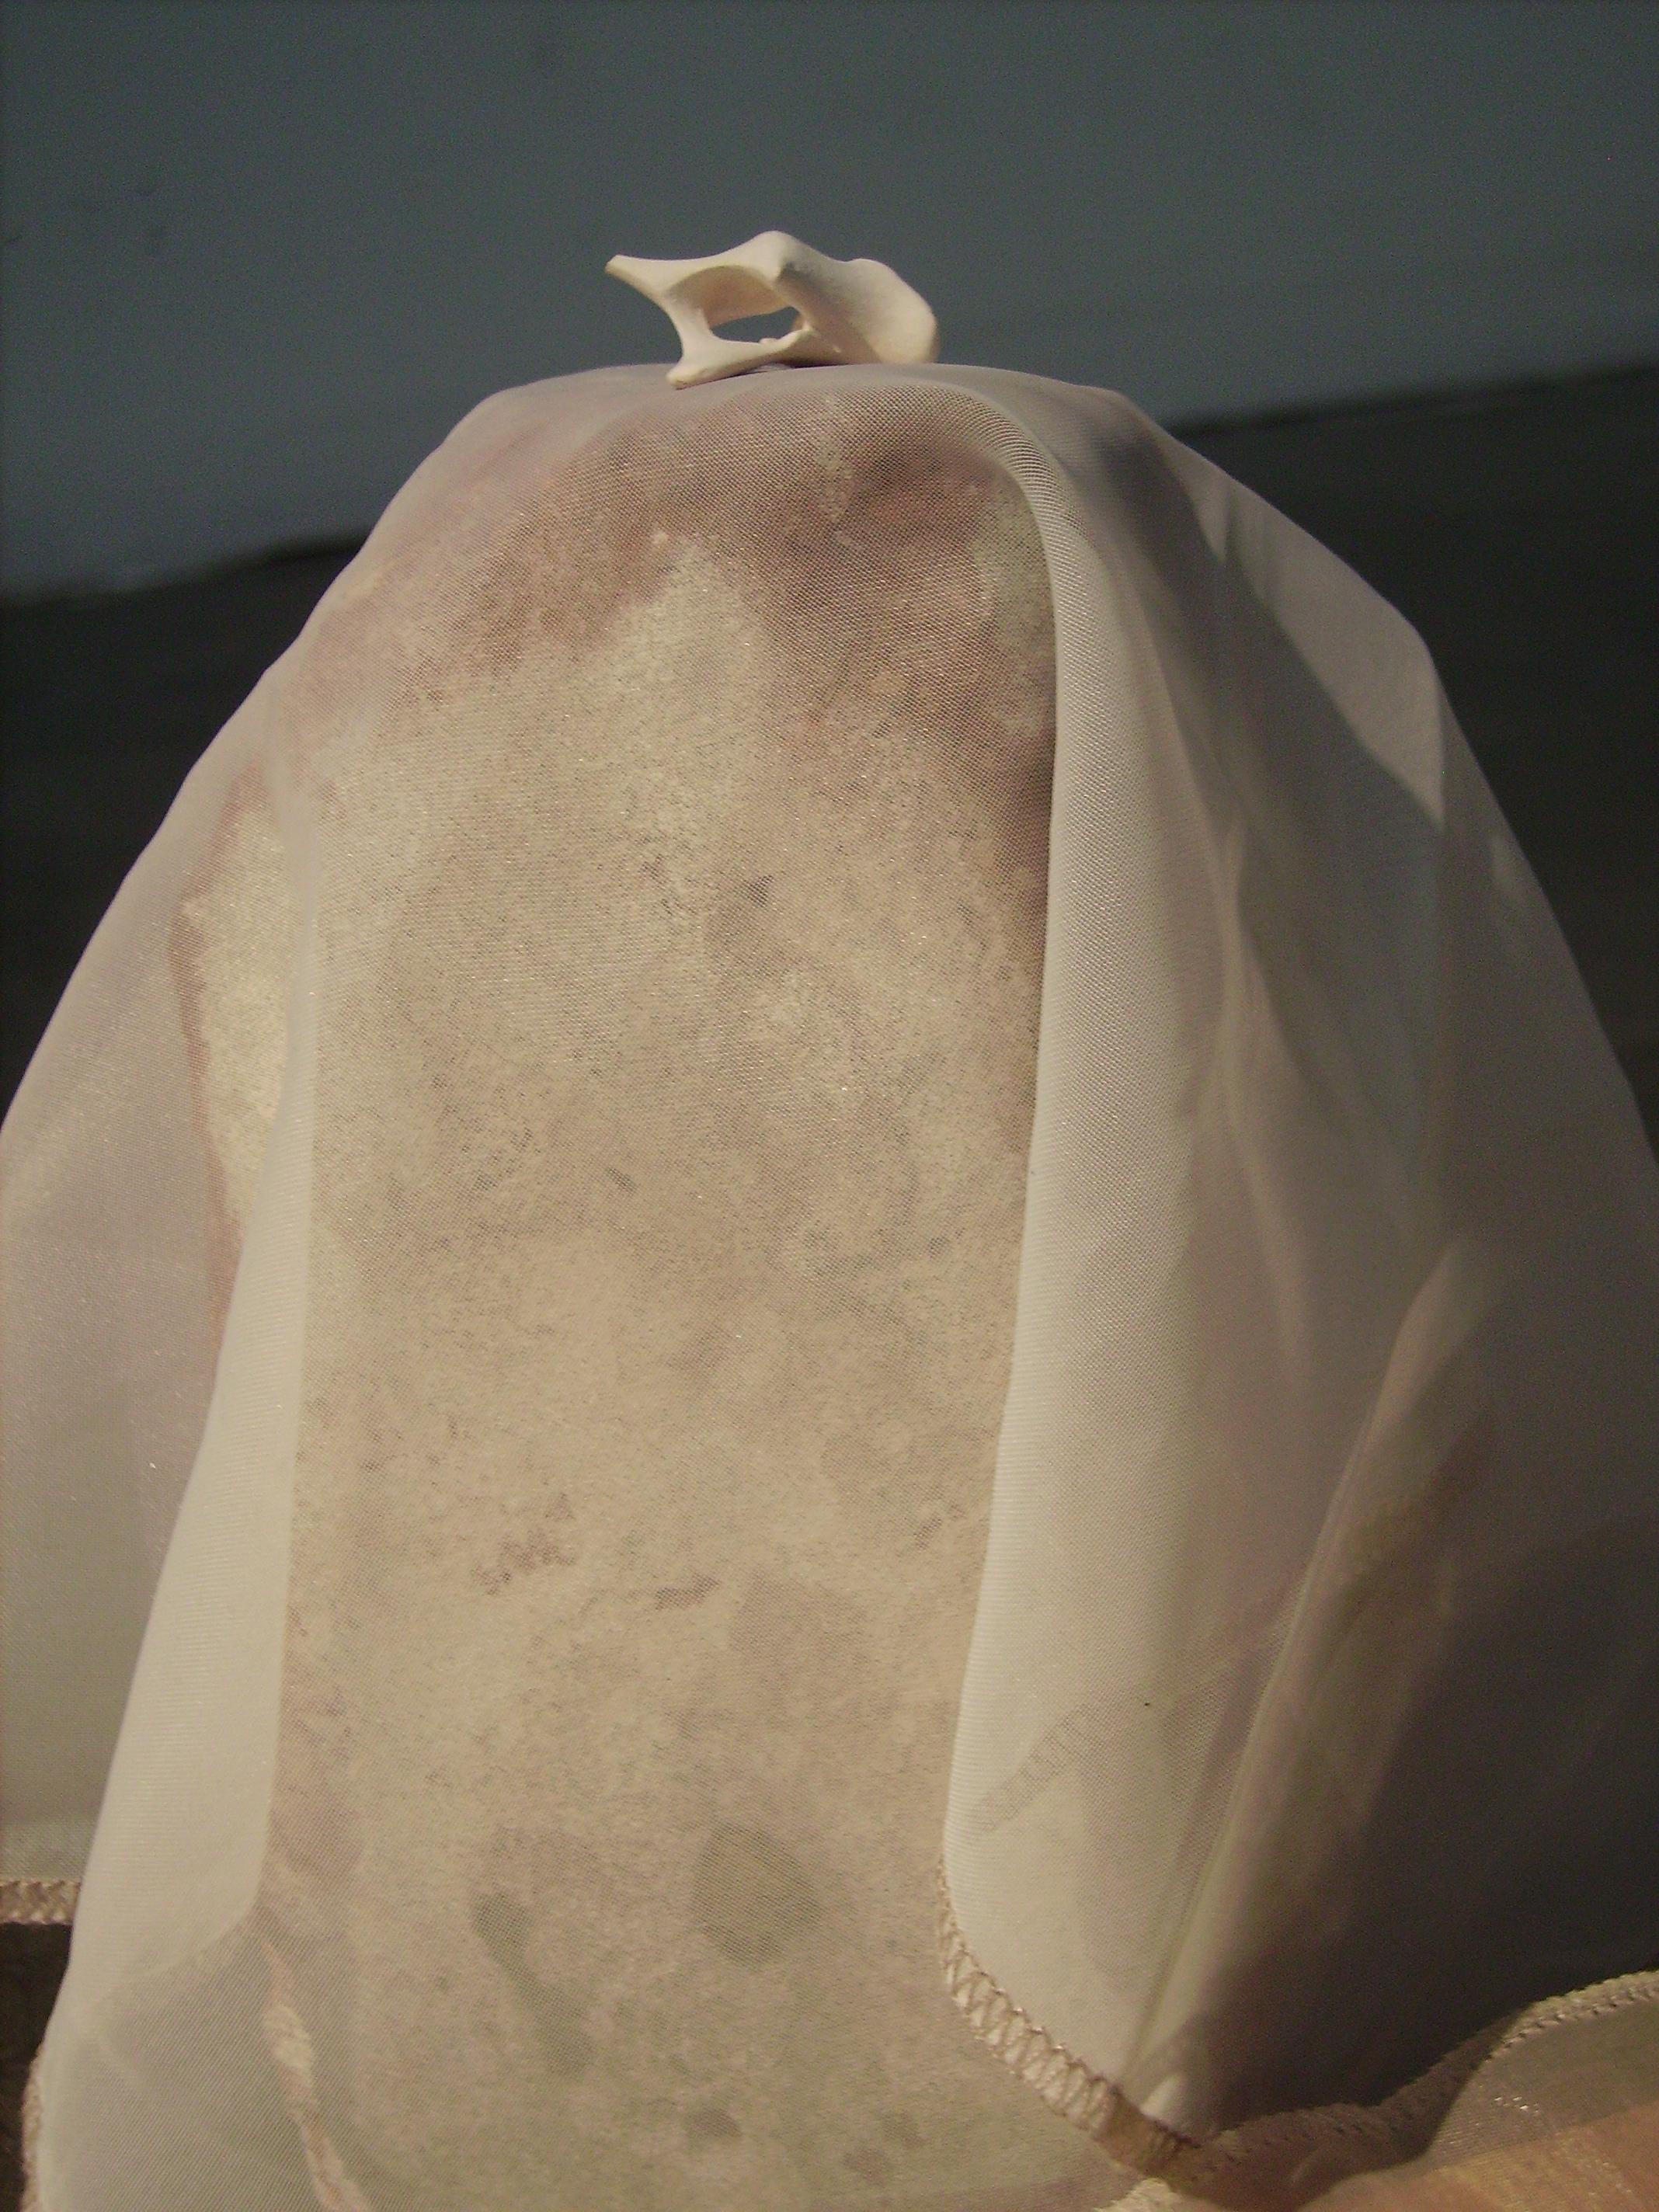 Pedestal, detail